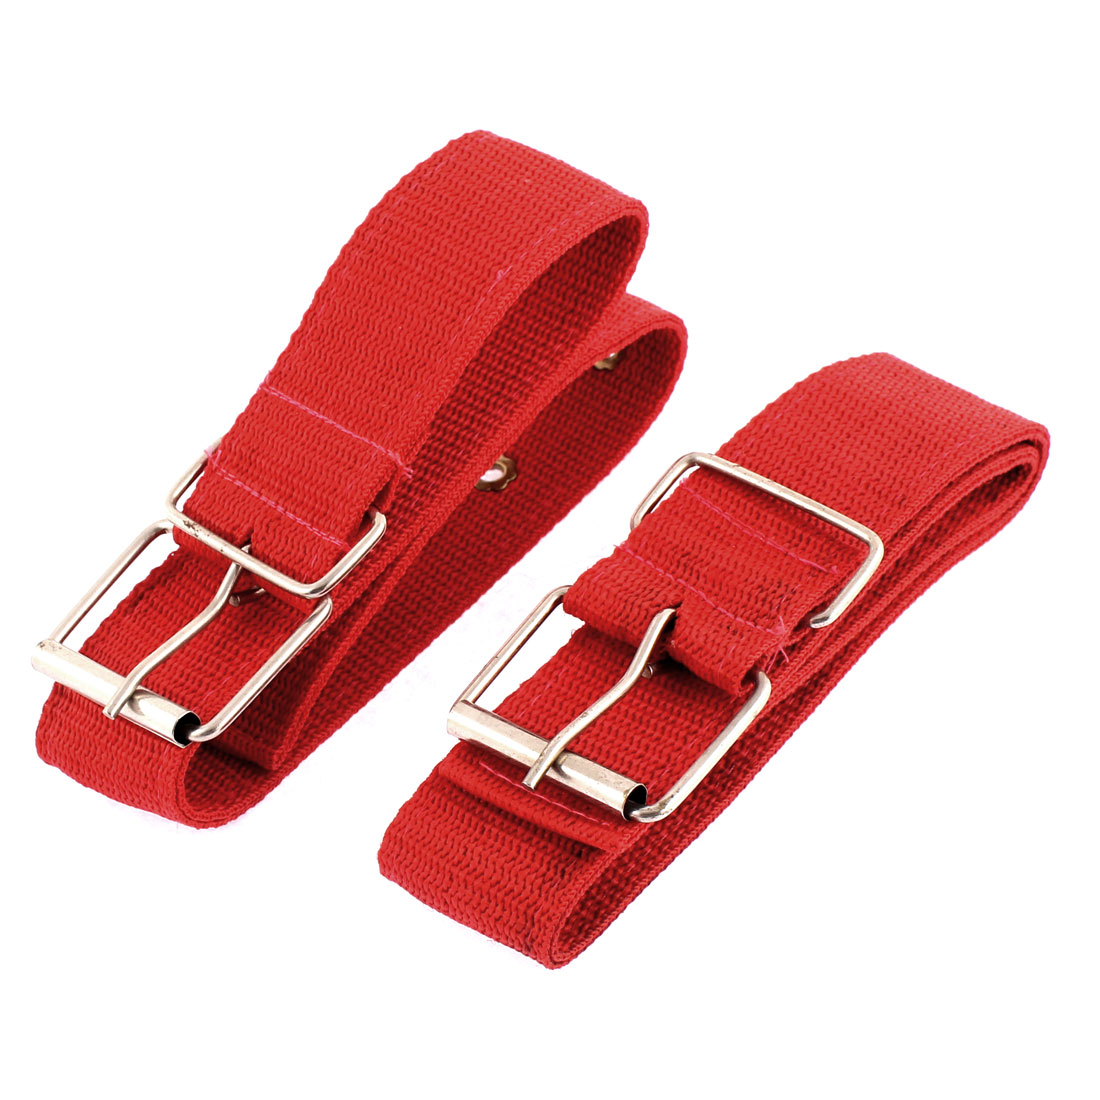 Pet Dog Single Pin Buckle Lead Harness Belt Collar Red 58cm Length 2pcs